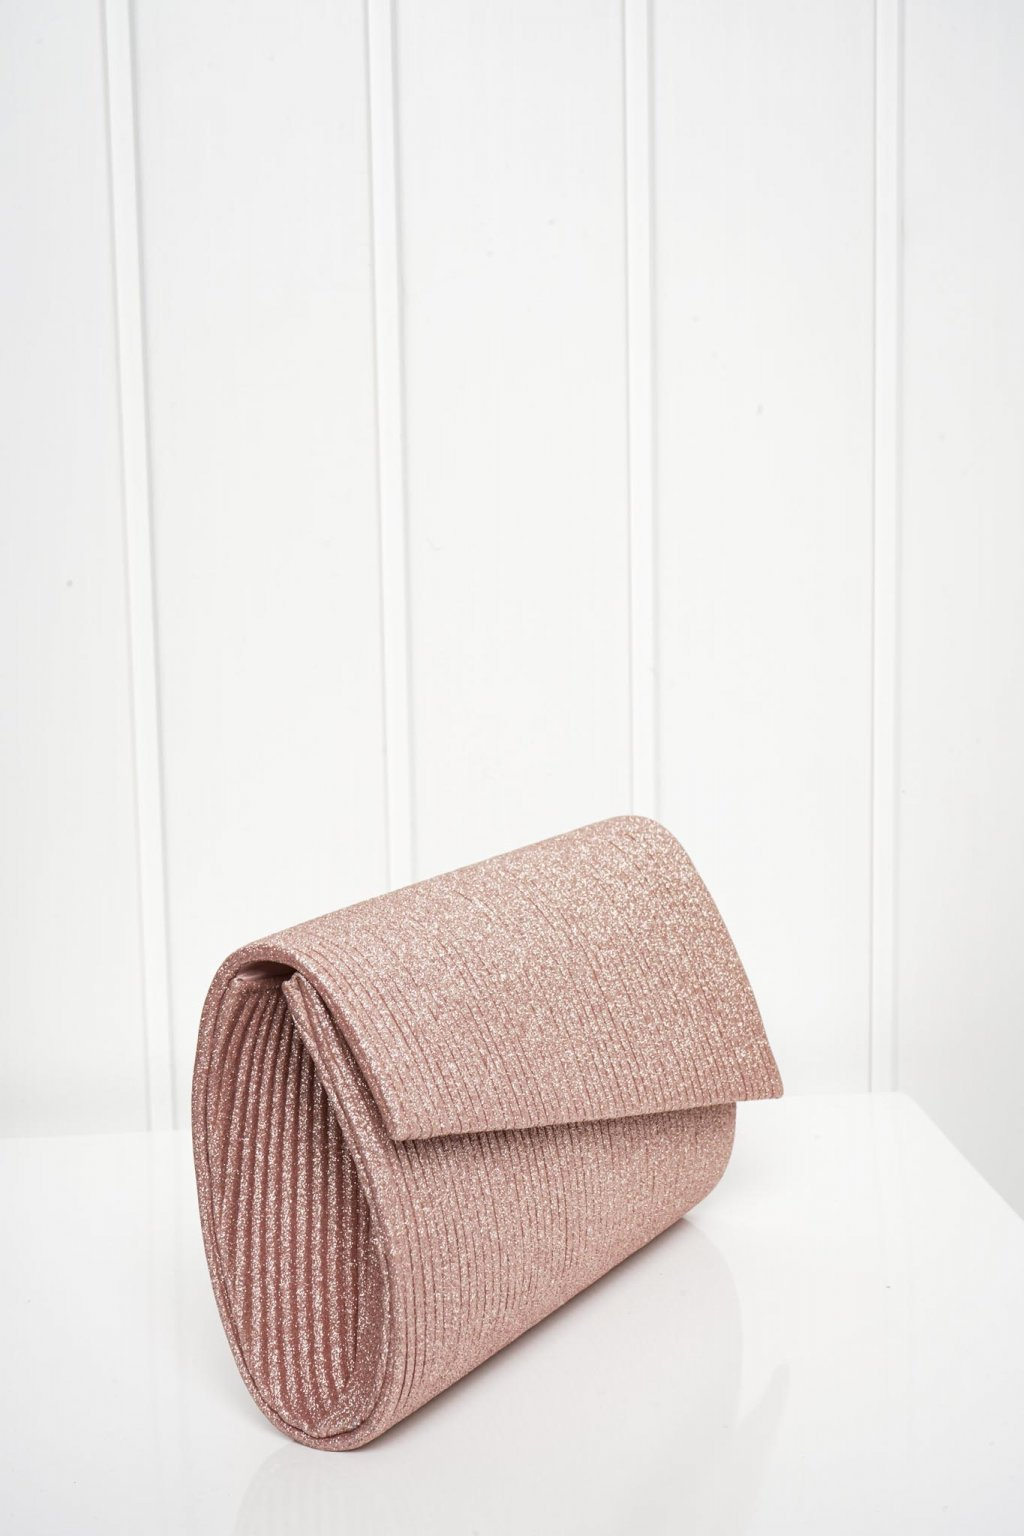 Kabelka, crossbody, ruksak, shopping bag, shopperka, 537